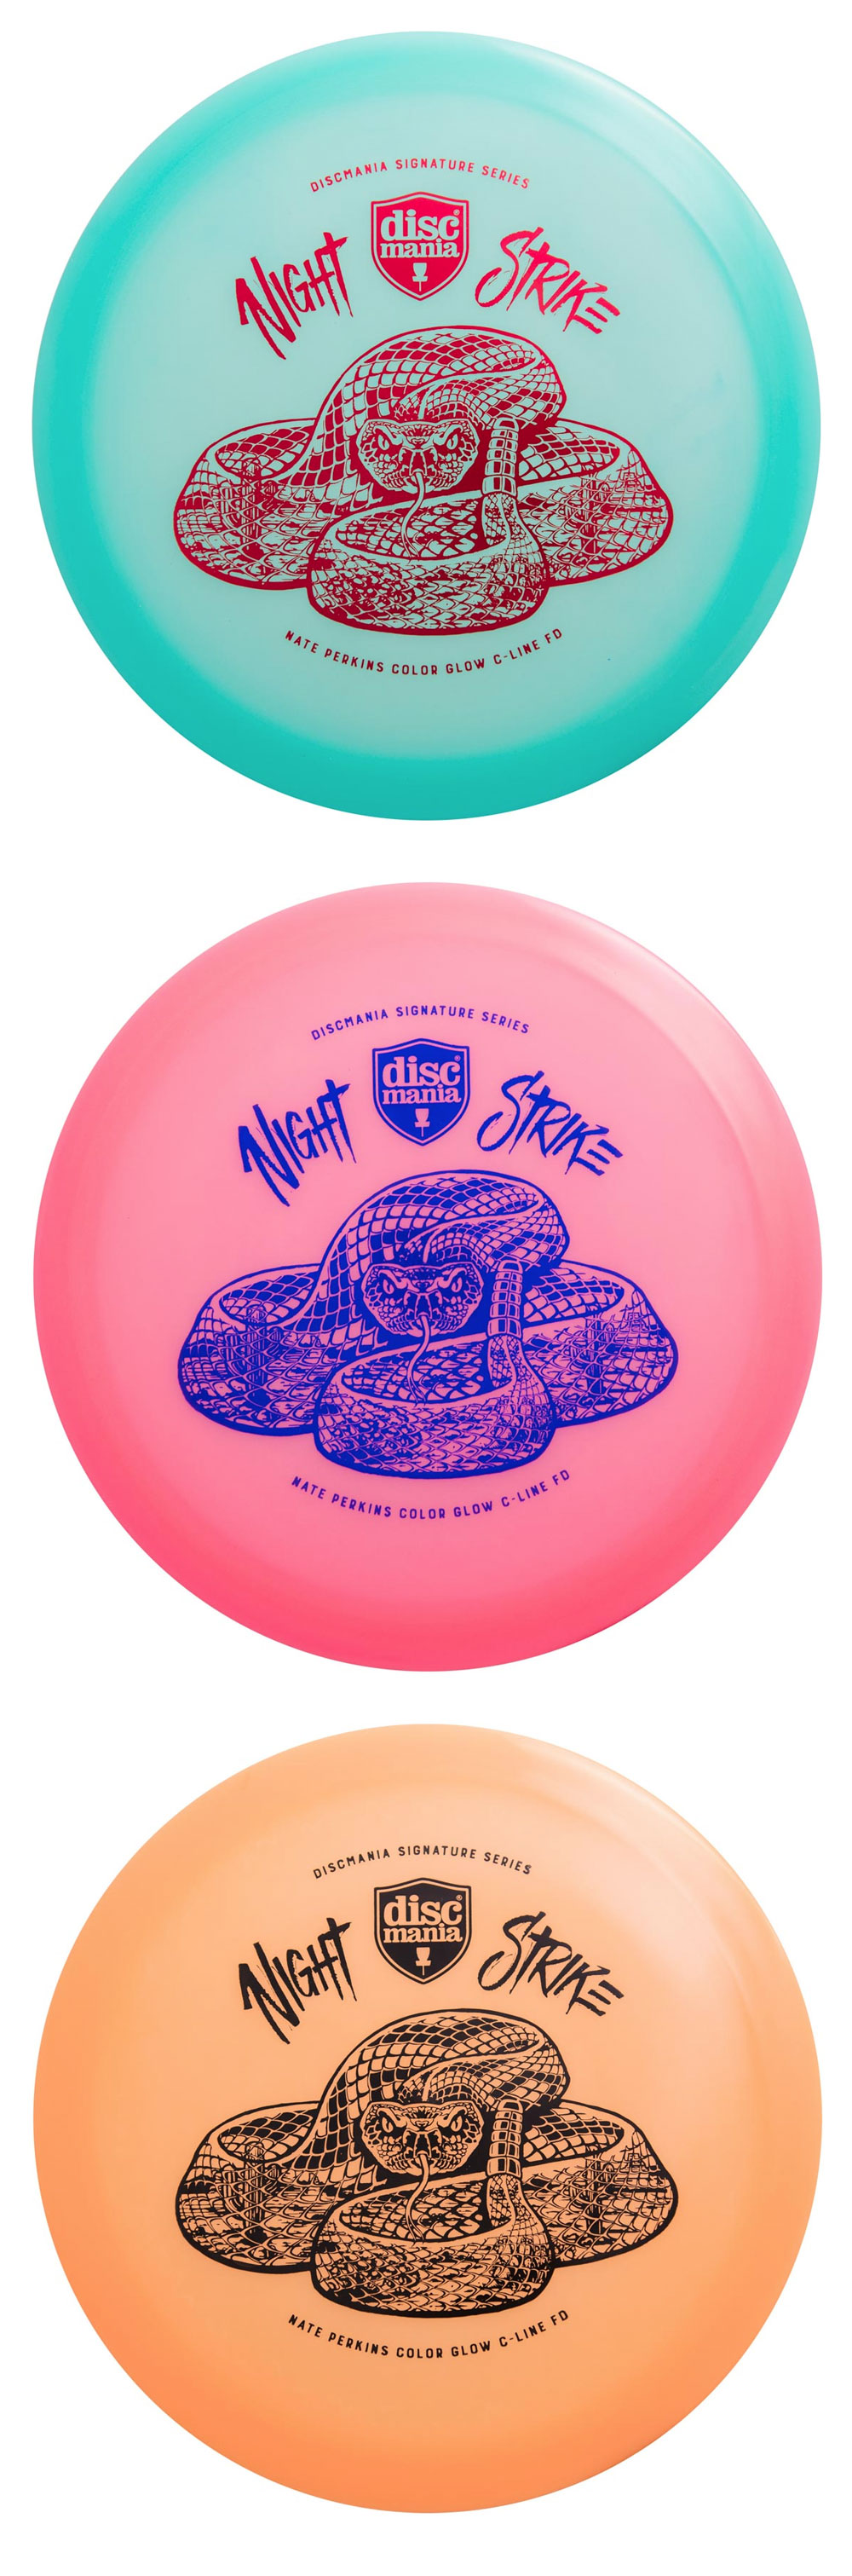 FD Glow C-line Night Strike Nate Perkins 2018